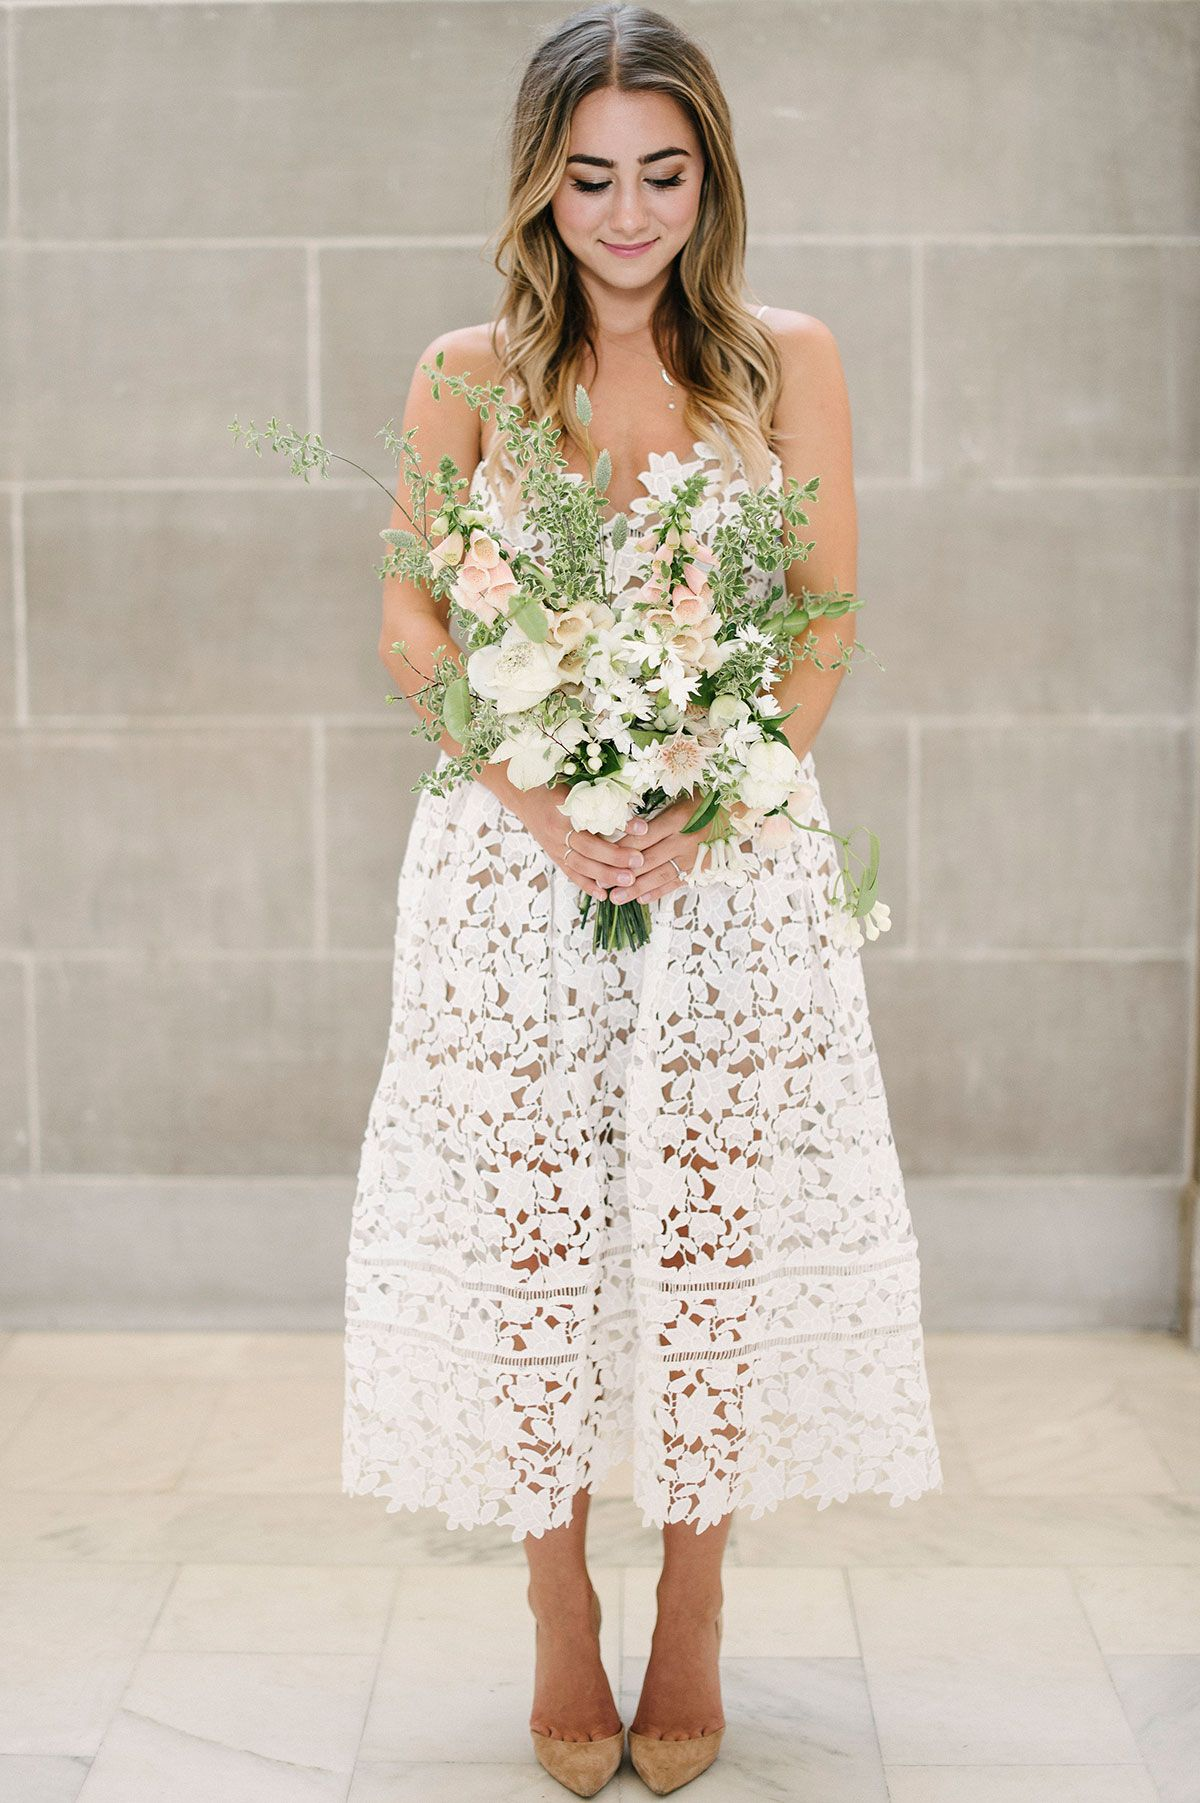 Ten City Hall Wedding Tips